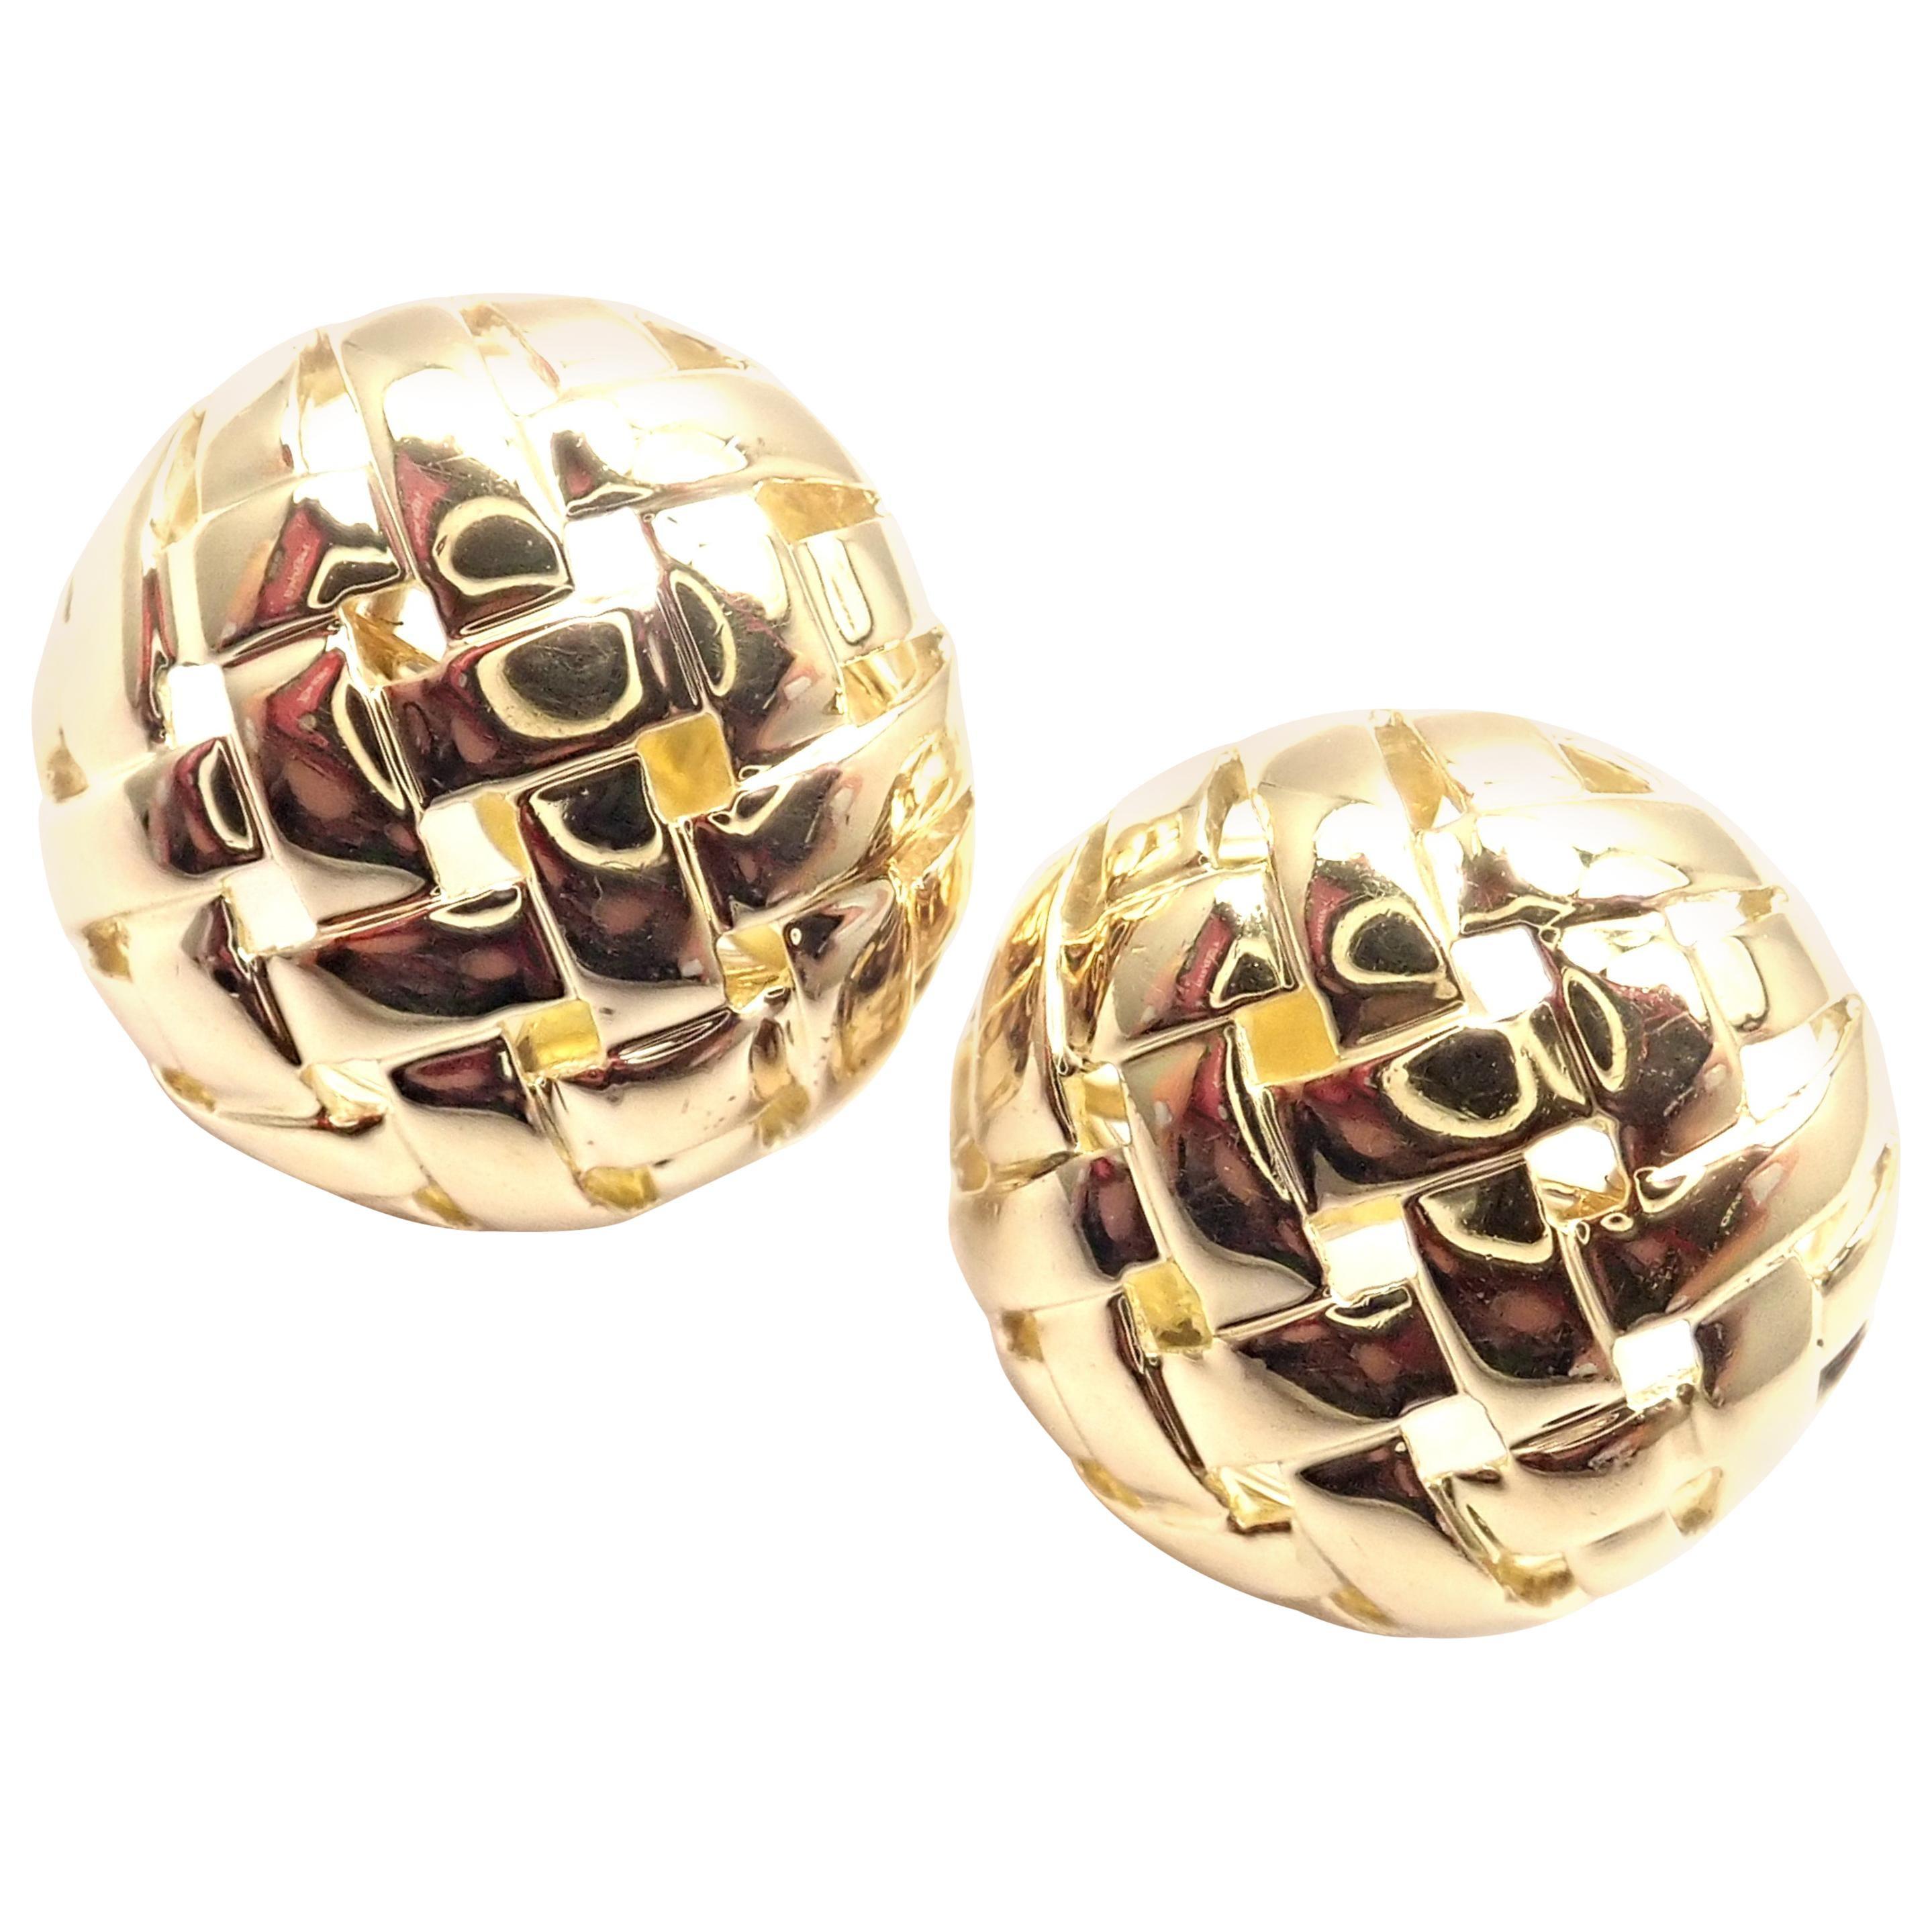 Vintage Tiffany & Co. Vannerie Basket Weave Yellow Gold Earrings